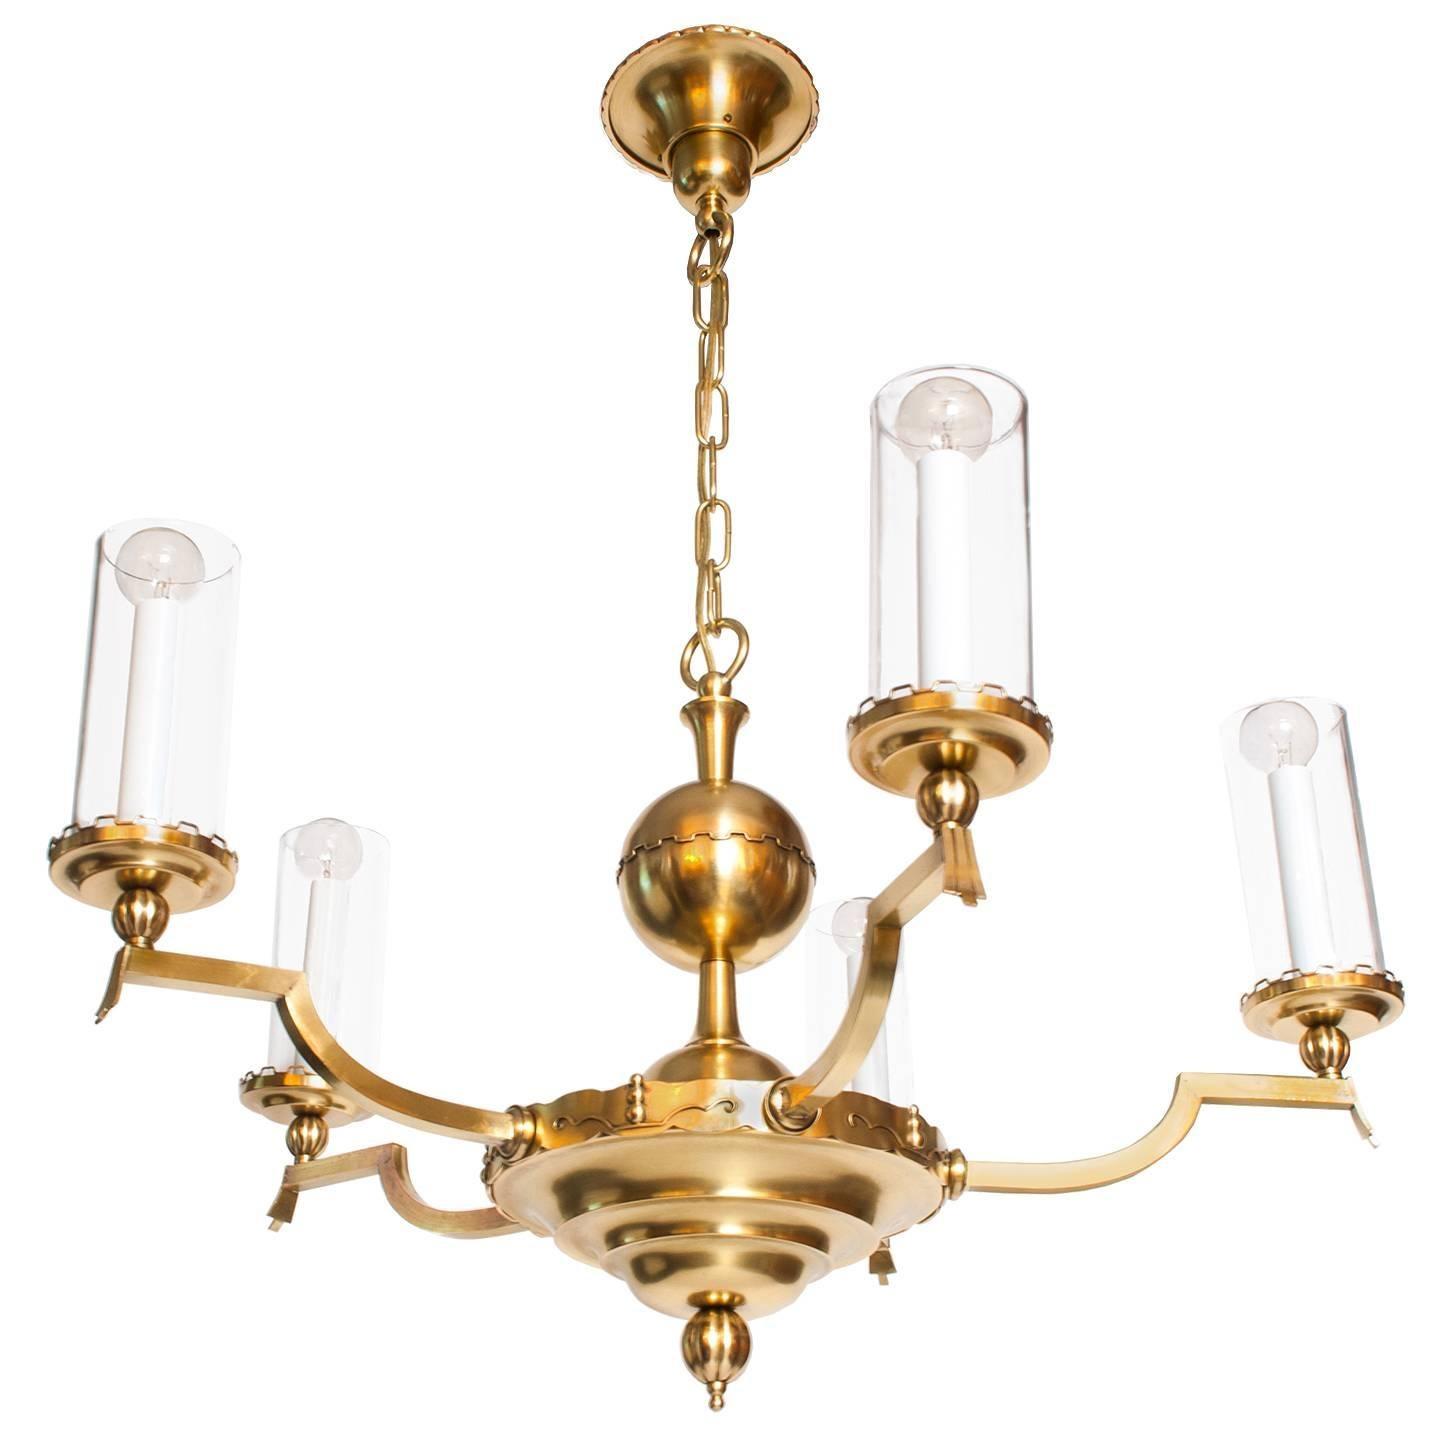 Scandinavian Modern Five-Arm Brass Chandelier with Cylindrical Glass Shades